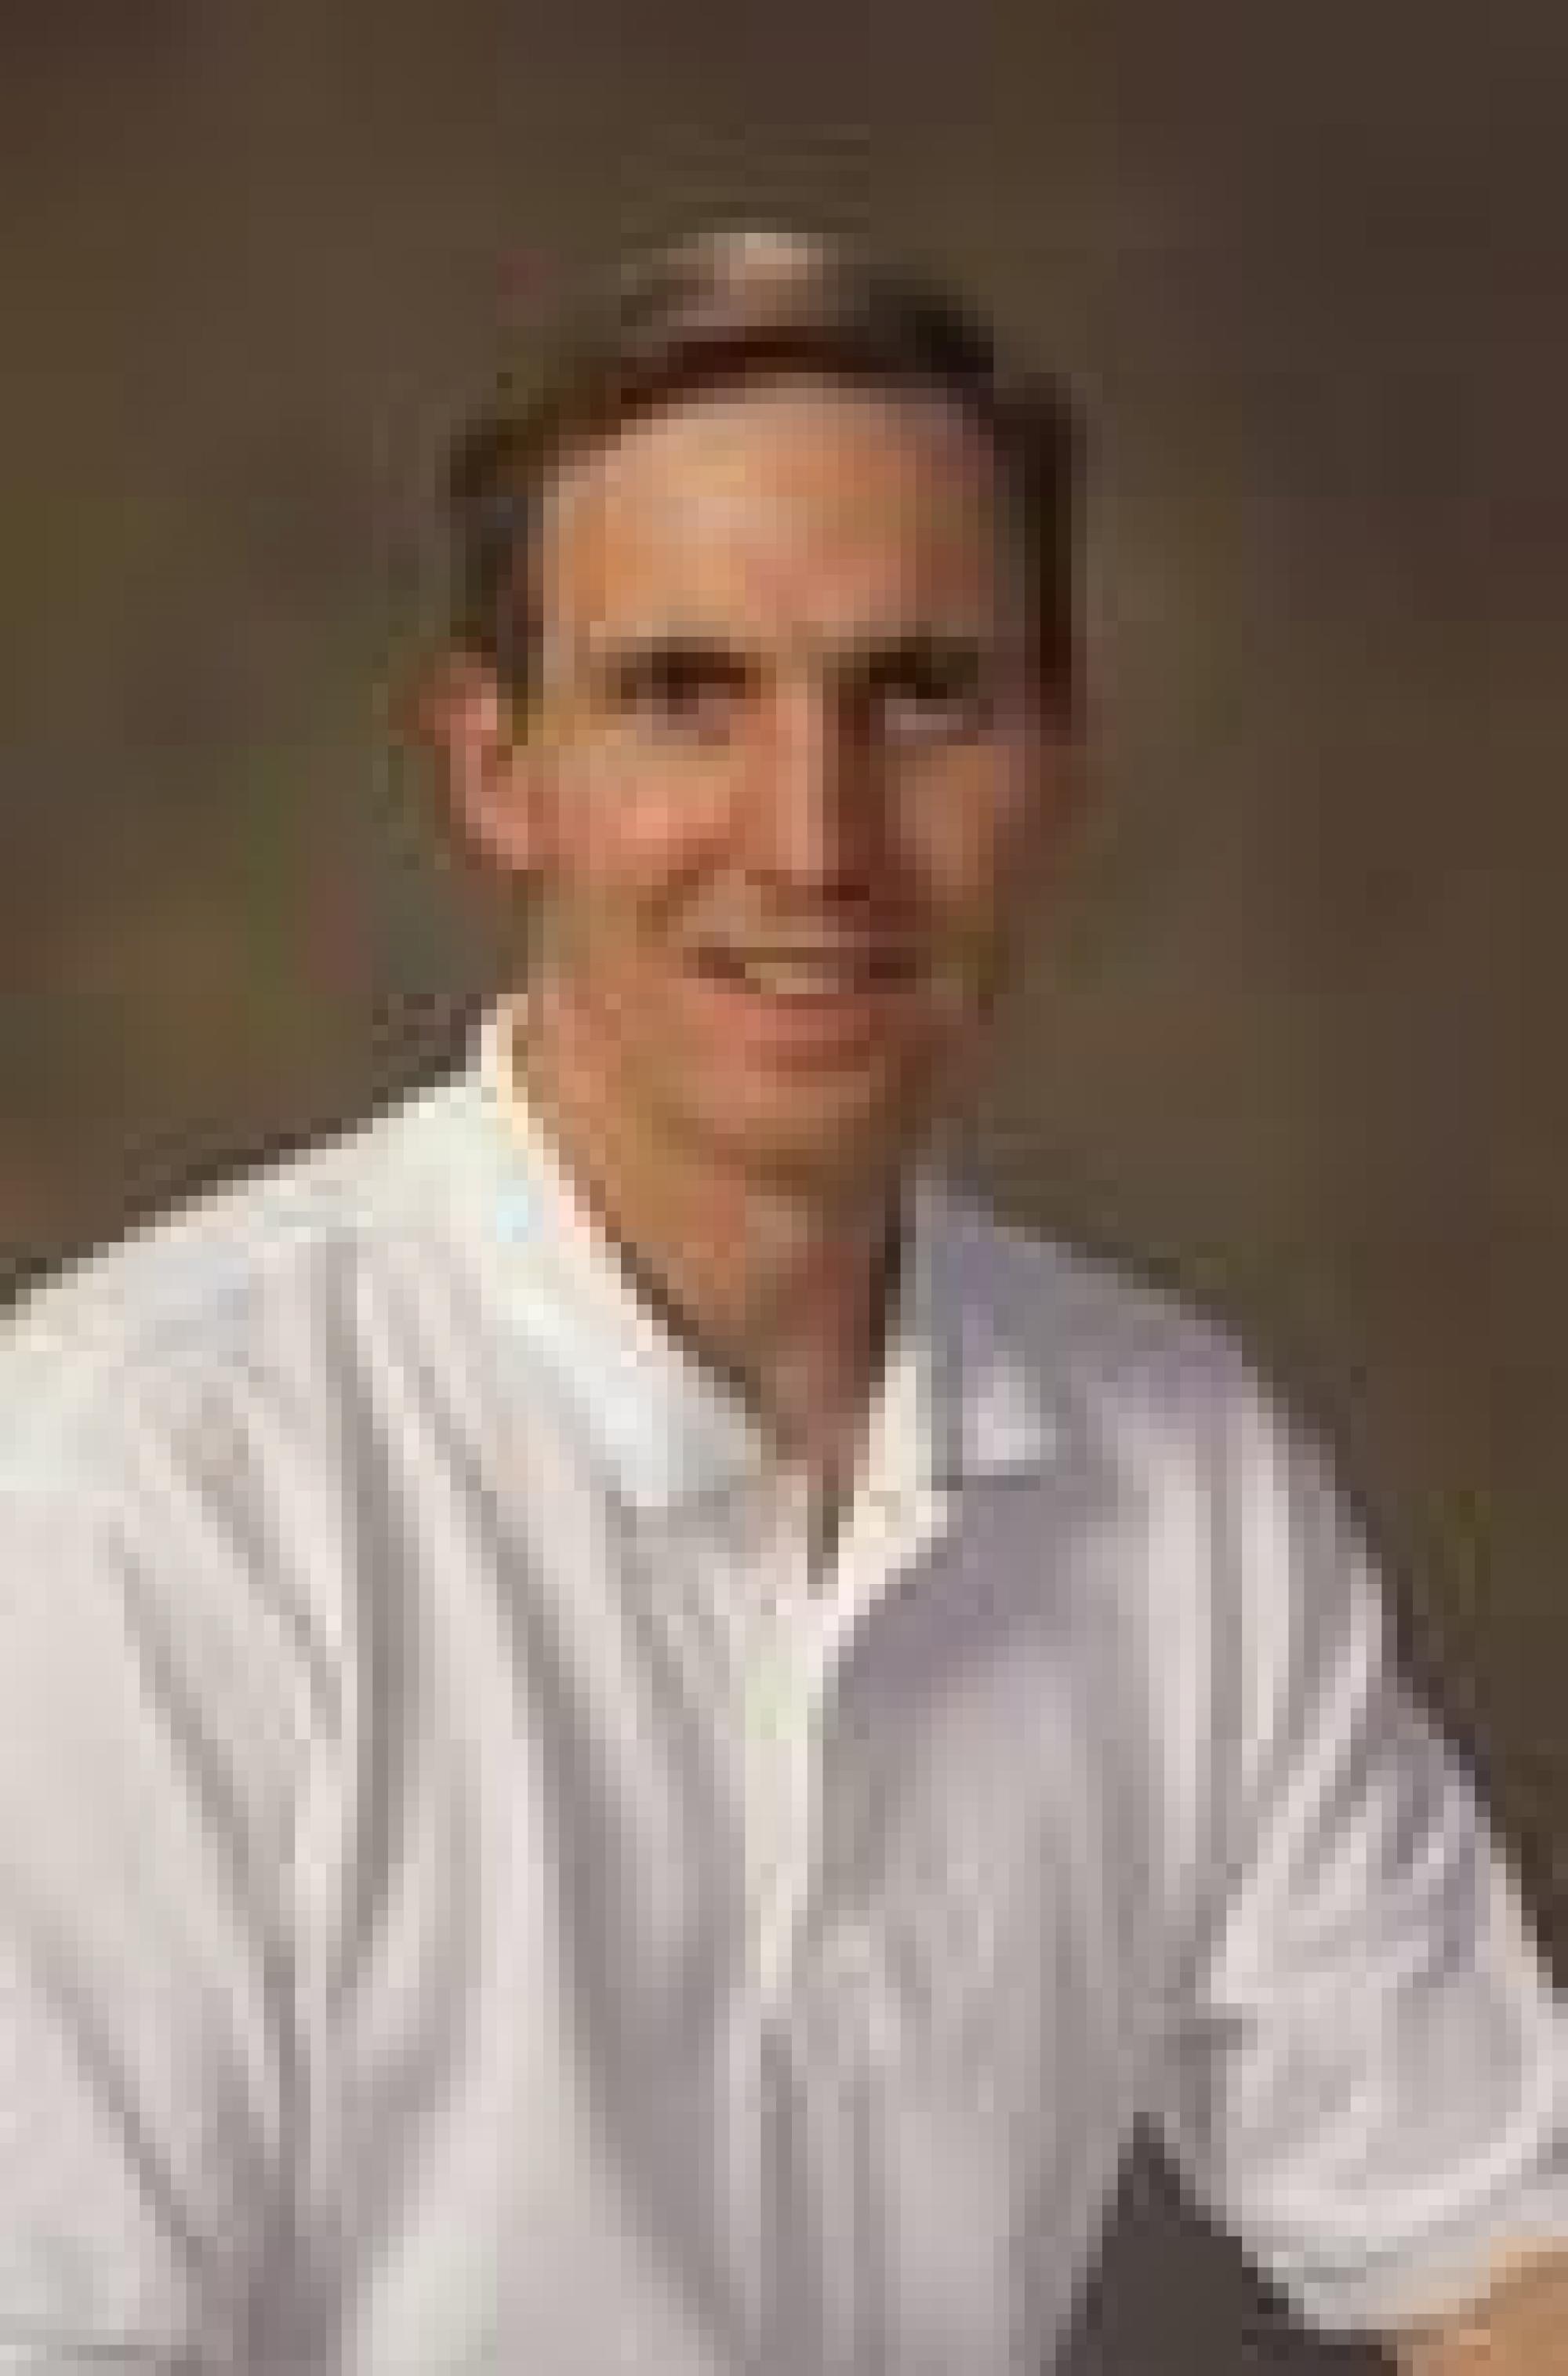 Dr. Jeff Burgess